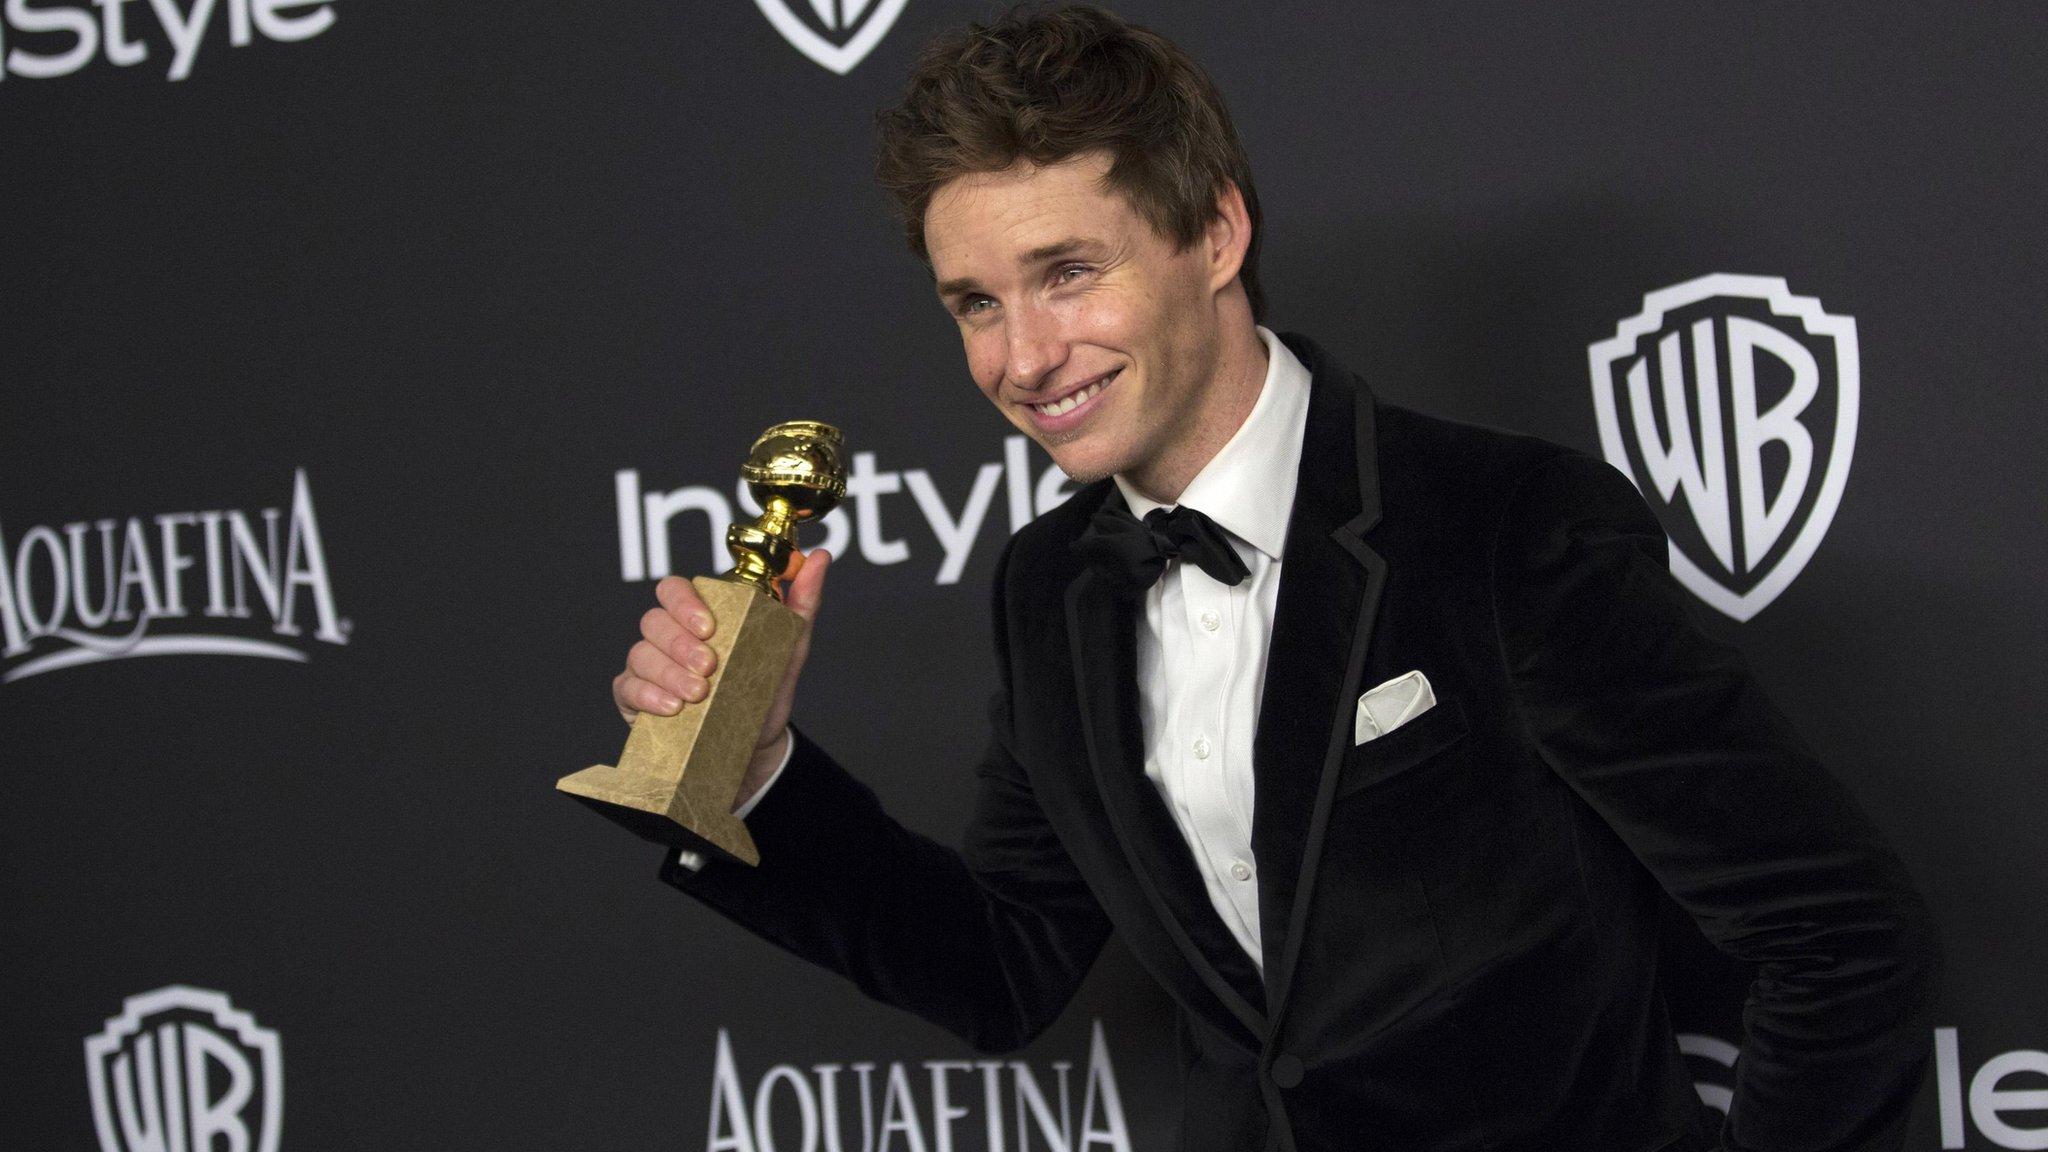 Catherine Zeta Jones News Newslocker Austin Flats Maxime White Putih 39 What Did The Golden Globes Tell Us About Next Months Oscars Bbc